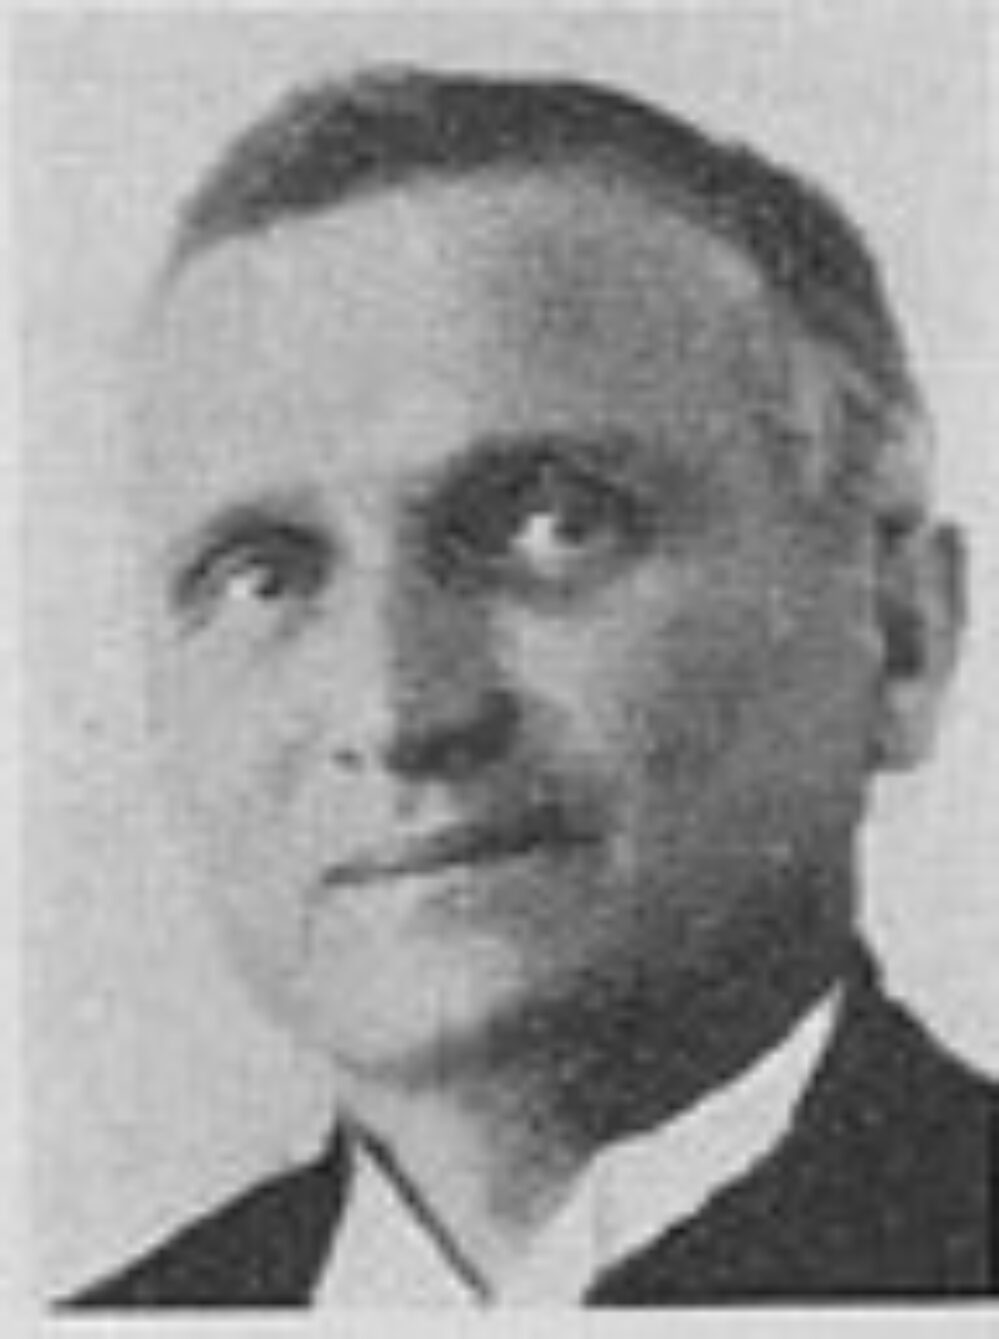 Herbert Kristian Ottersen